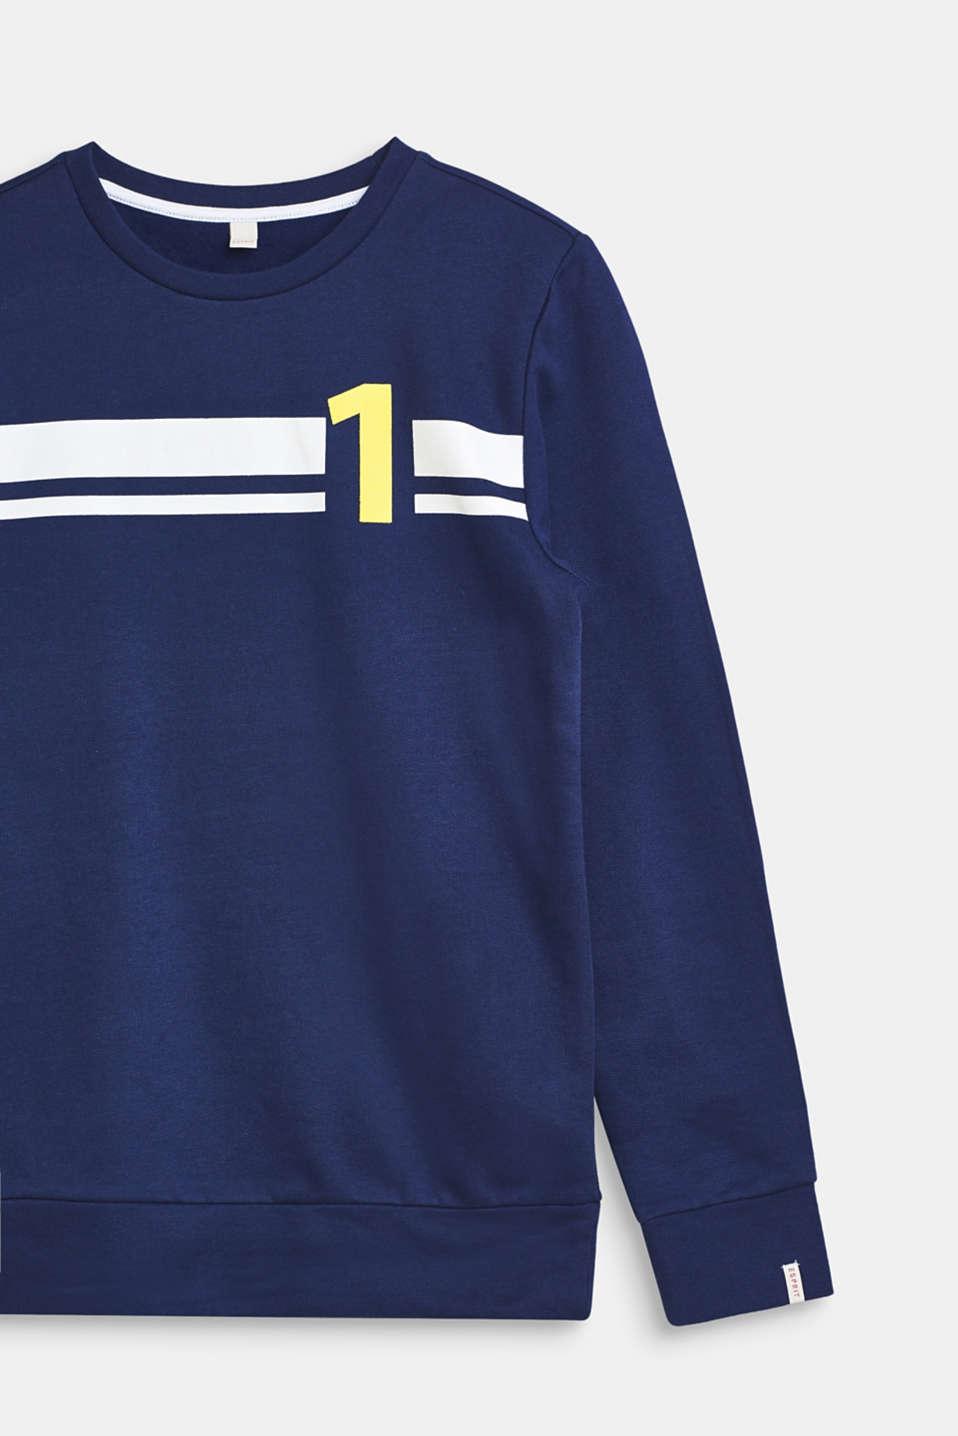 Sweatshirt in 100% cotton, LCMARINE BLUE, detail image number 2